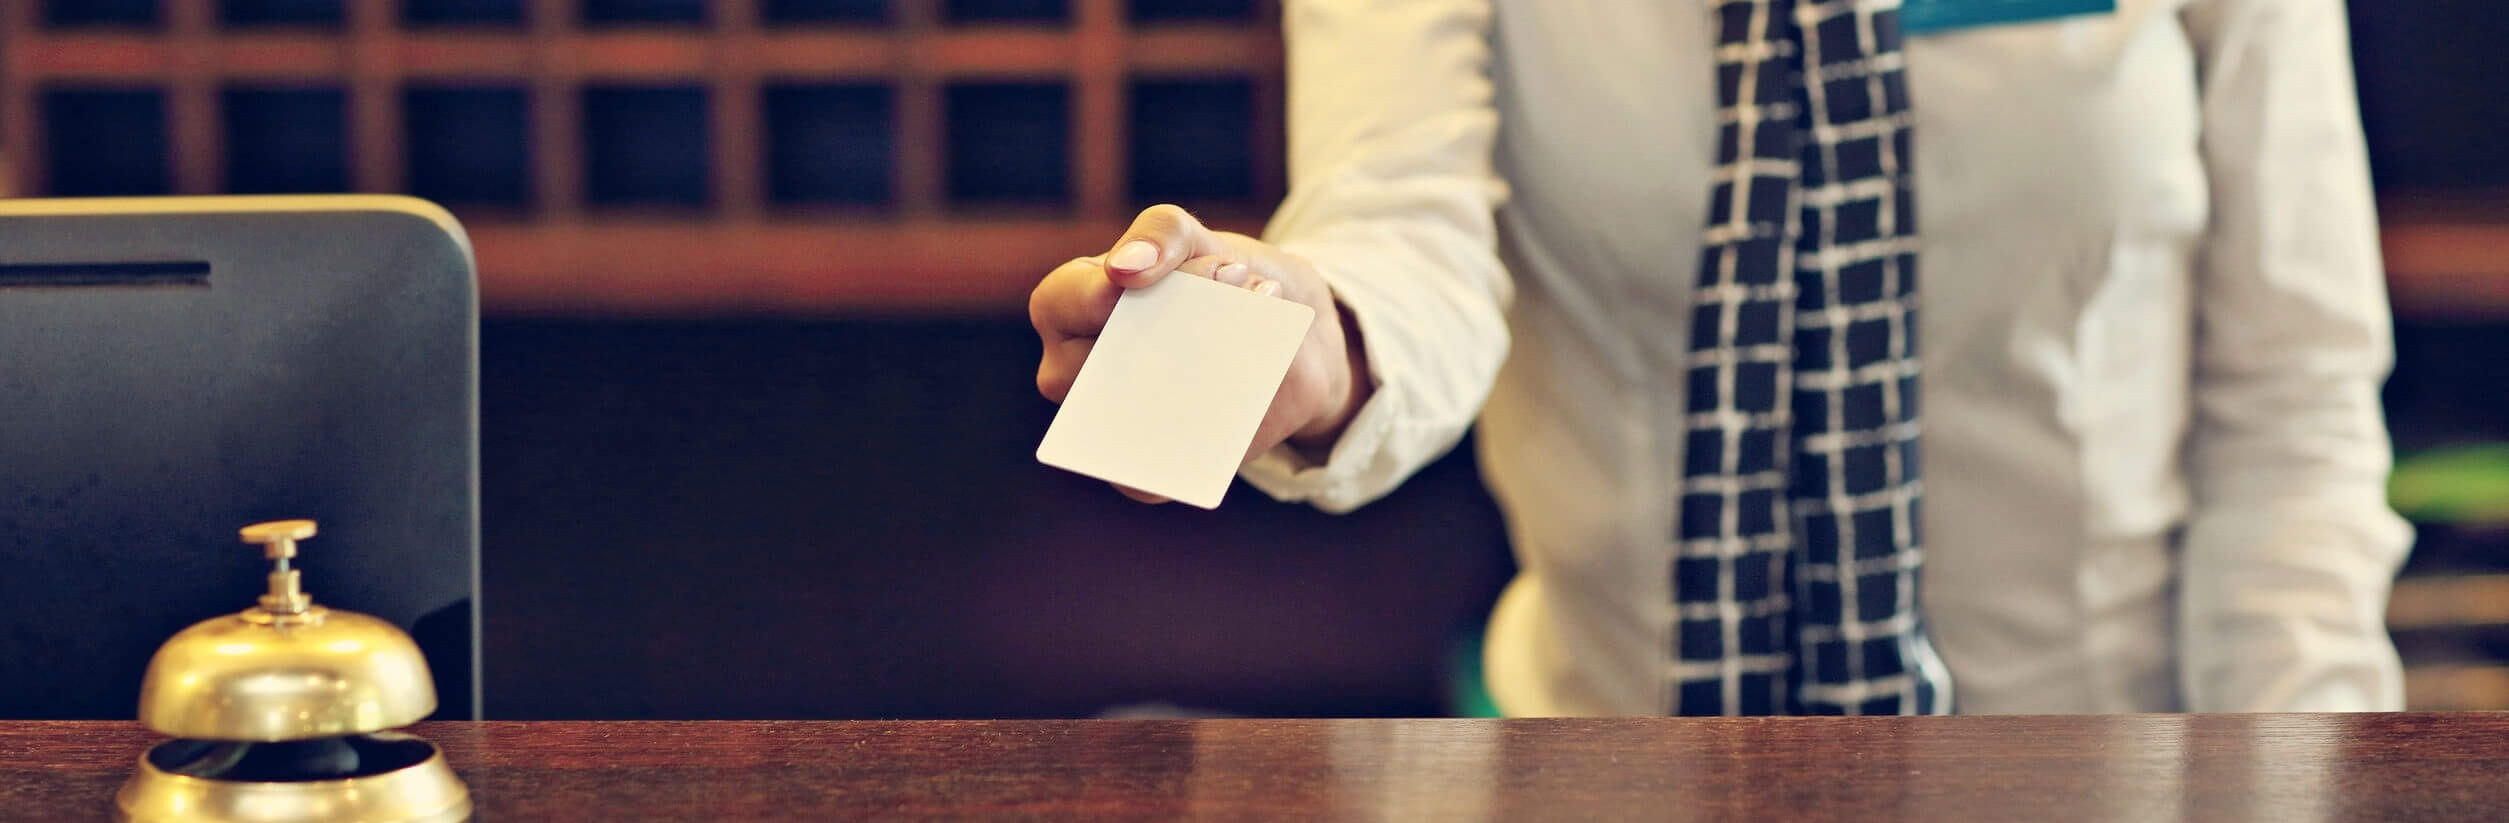 Hotelska kartica_Pametna kartica_kontrola pristopa_rfid kartica_mifare kartica_Andivi